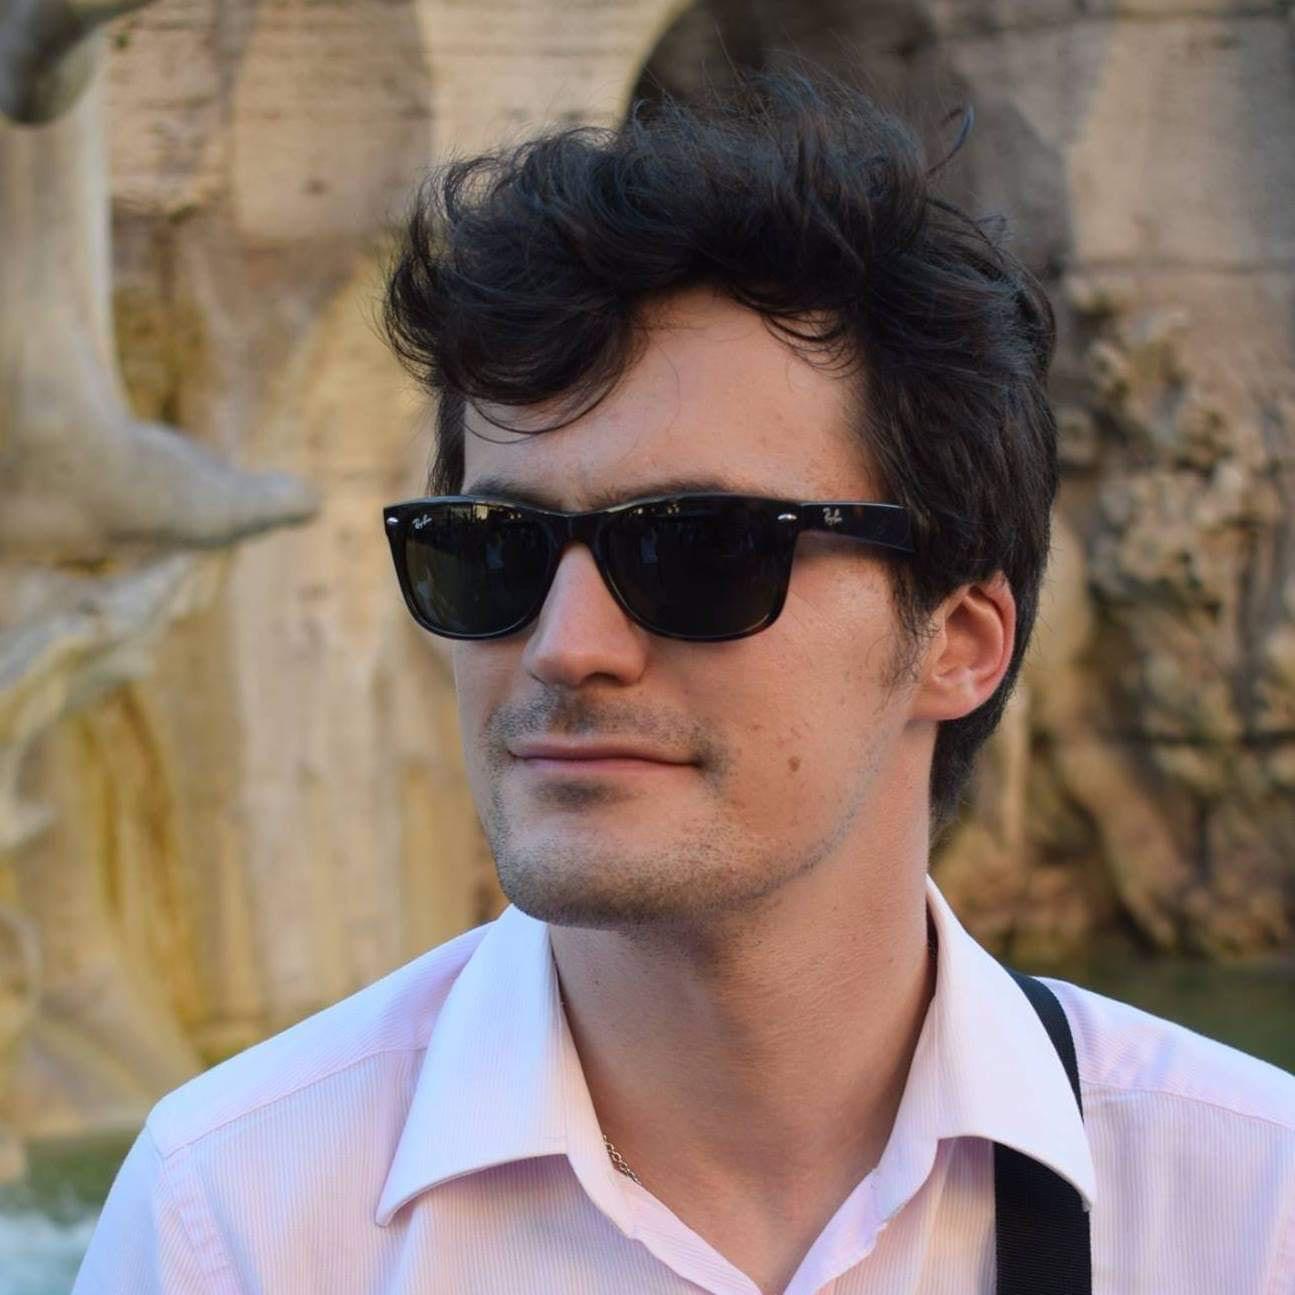 Go to Mateus Campos Felipe's profile